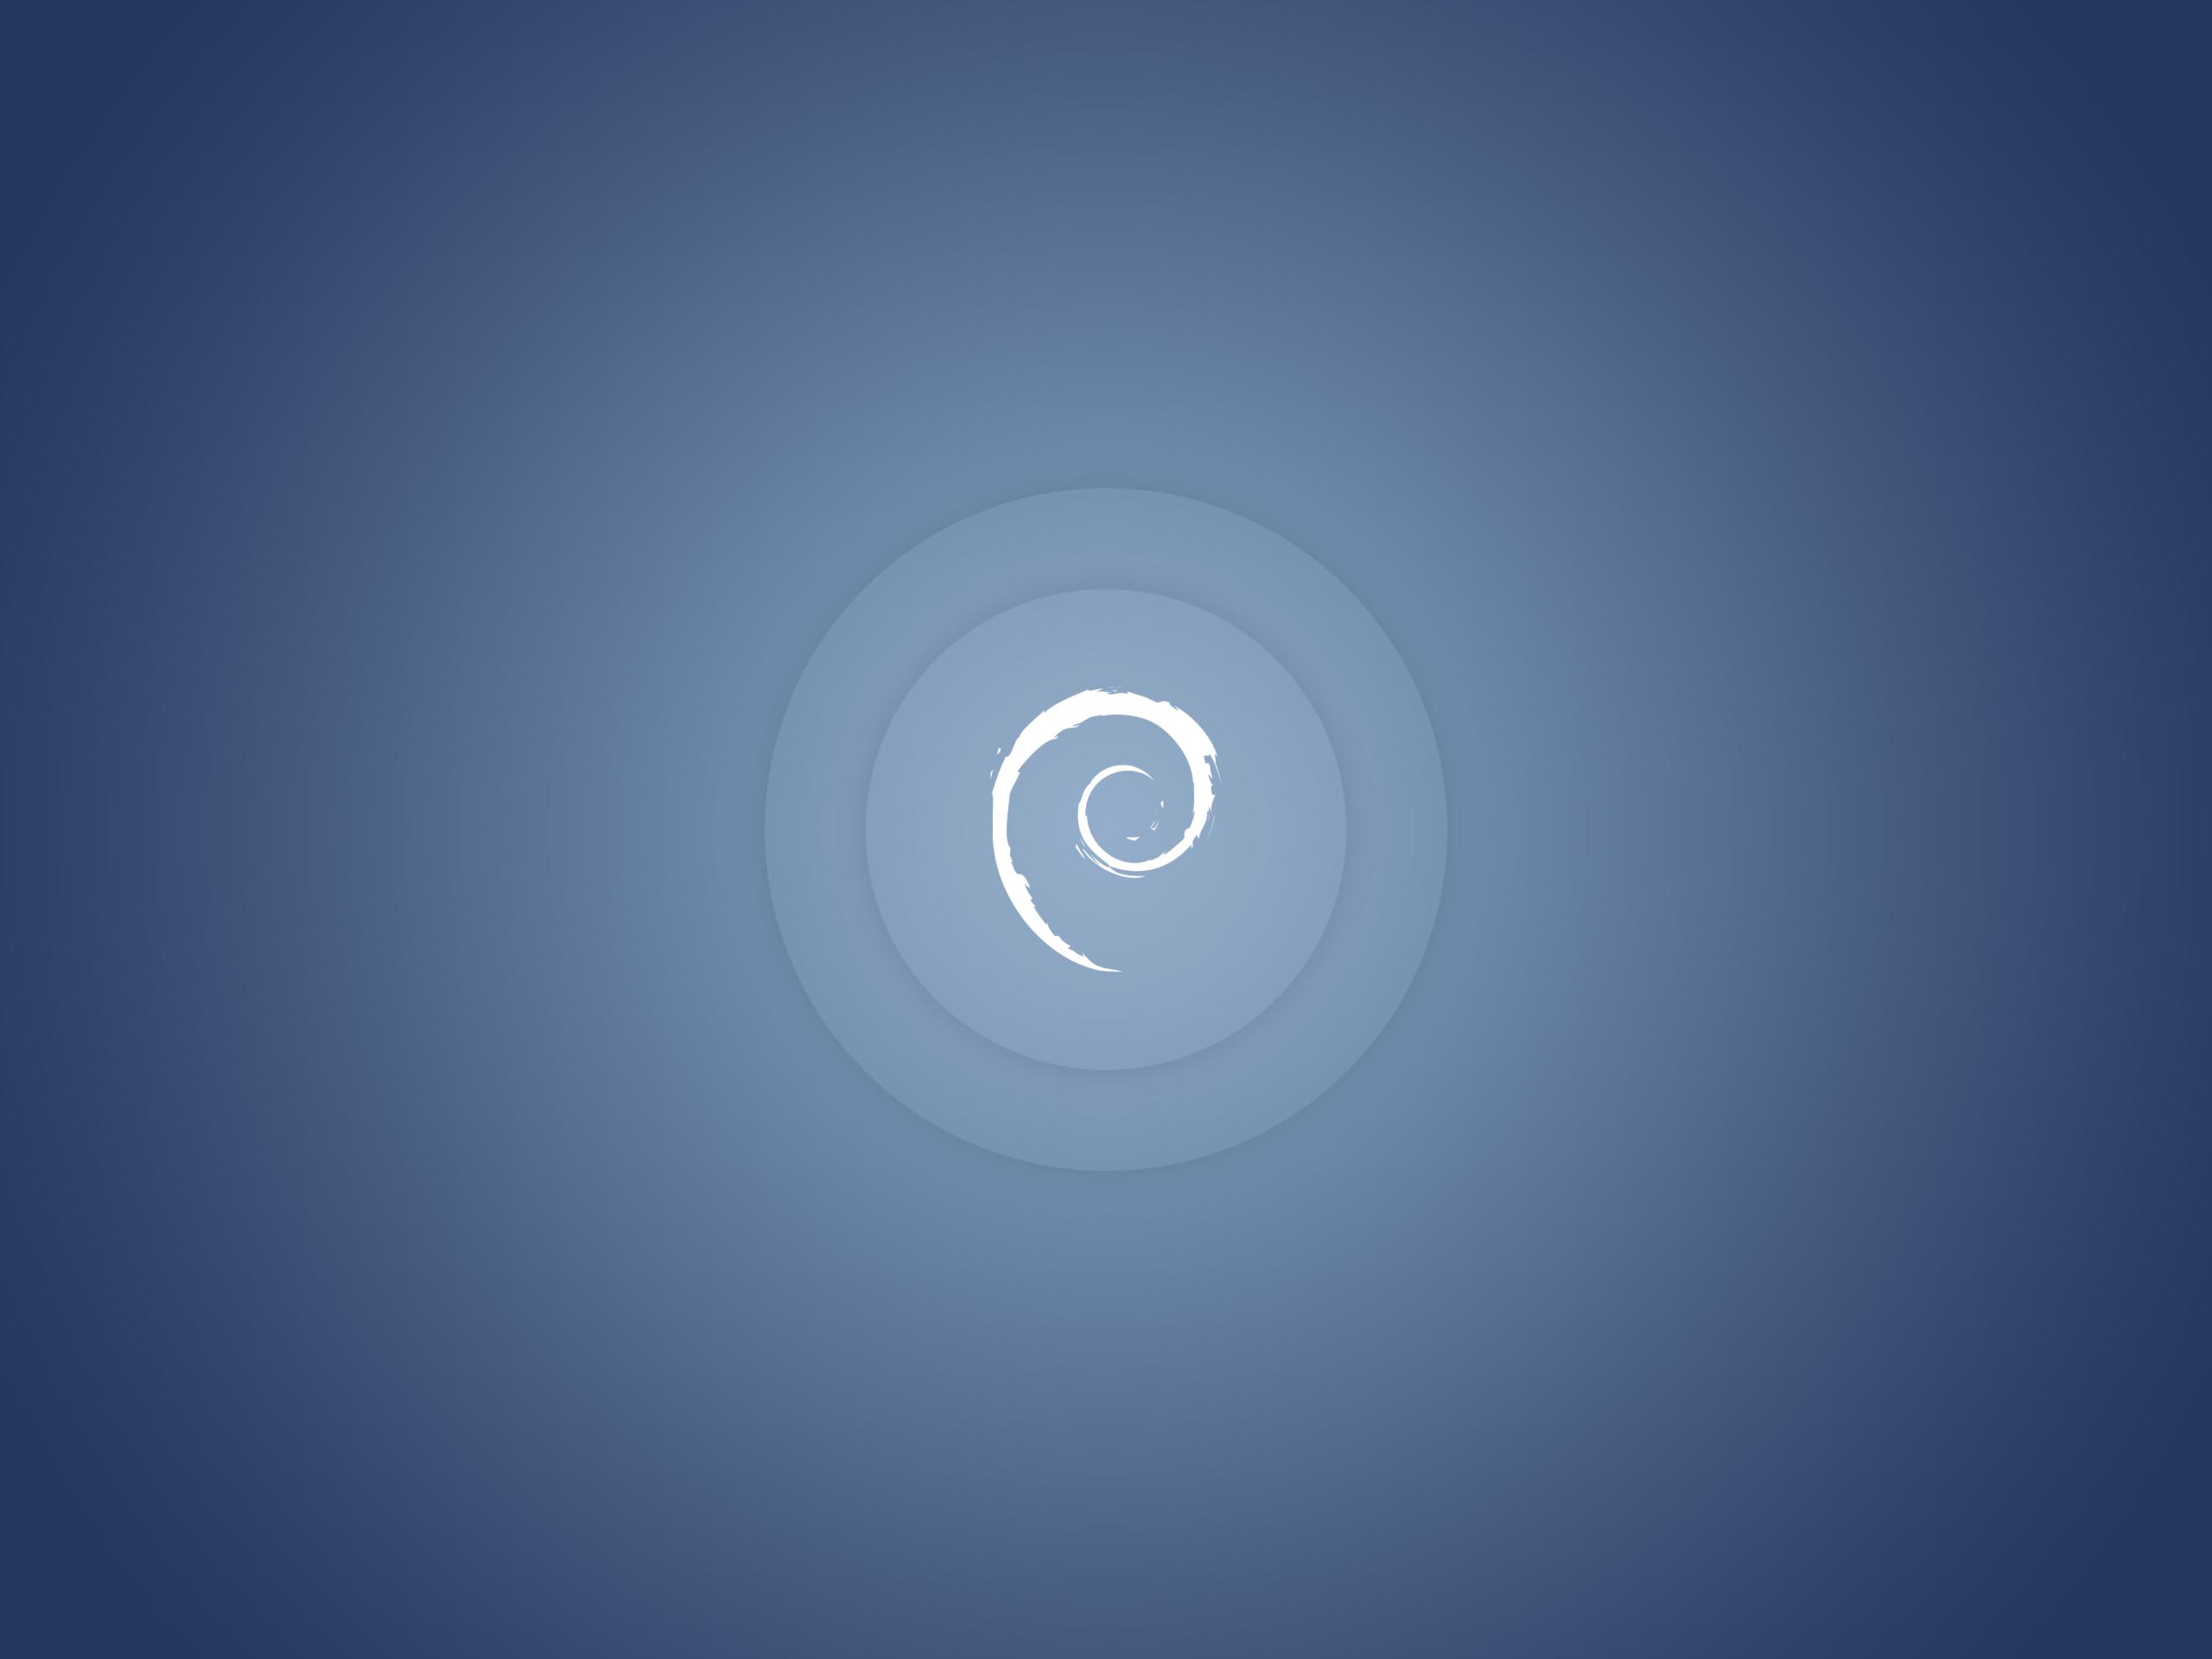 Debian Installer Bullseye Alpha 2 lançado com Linux 5.4